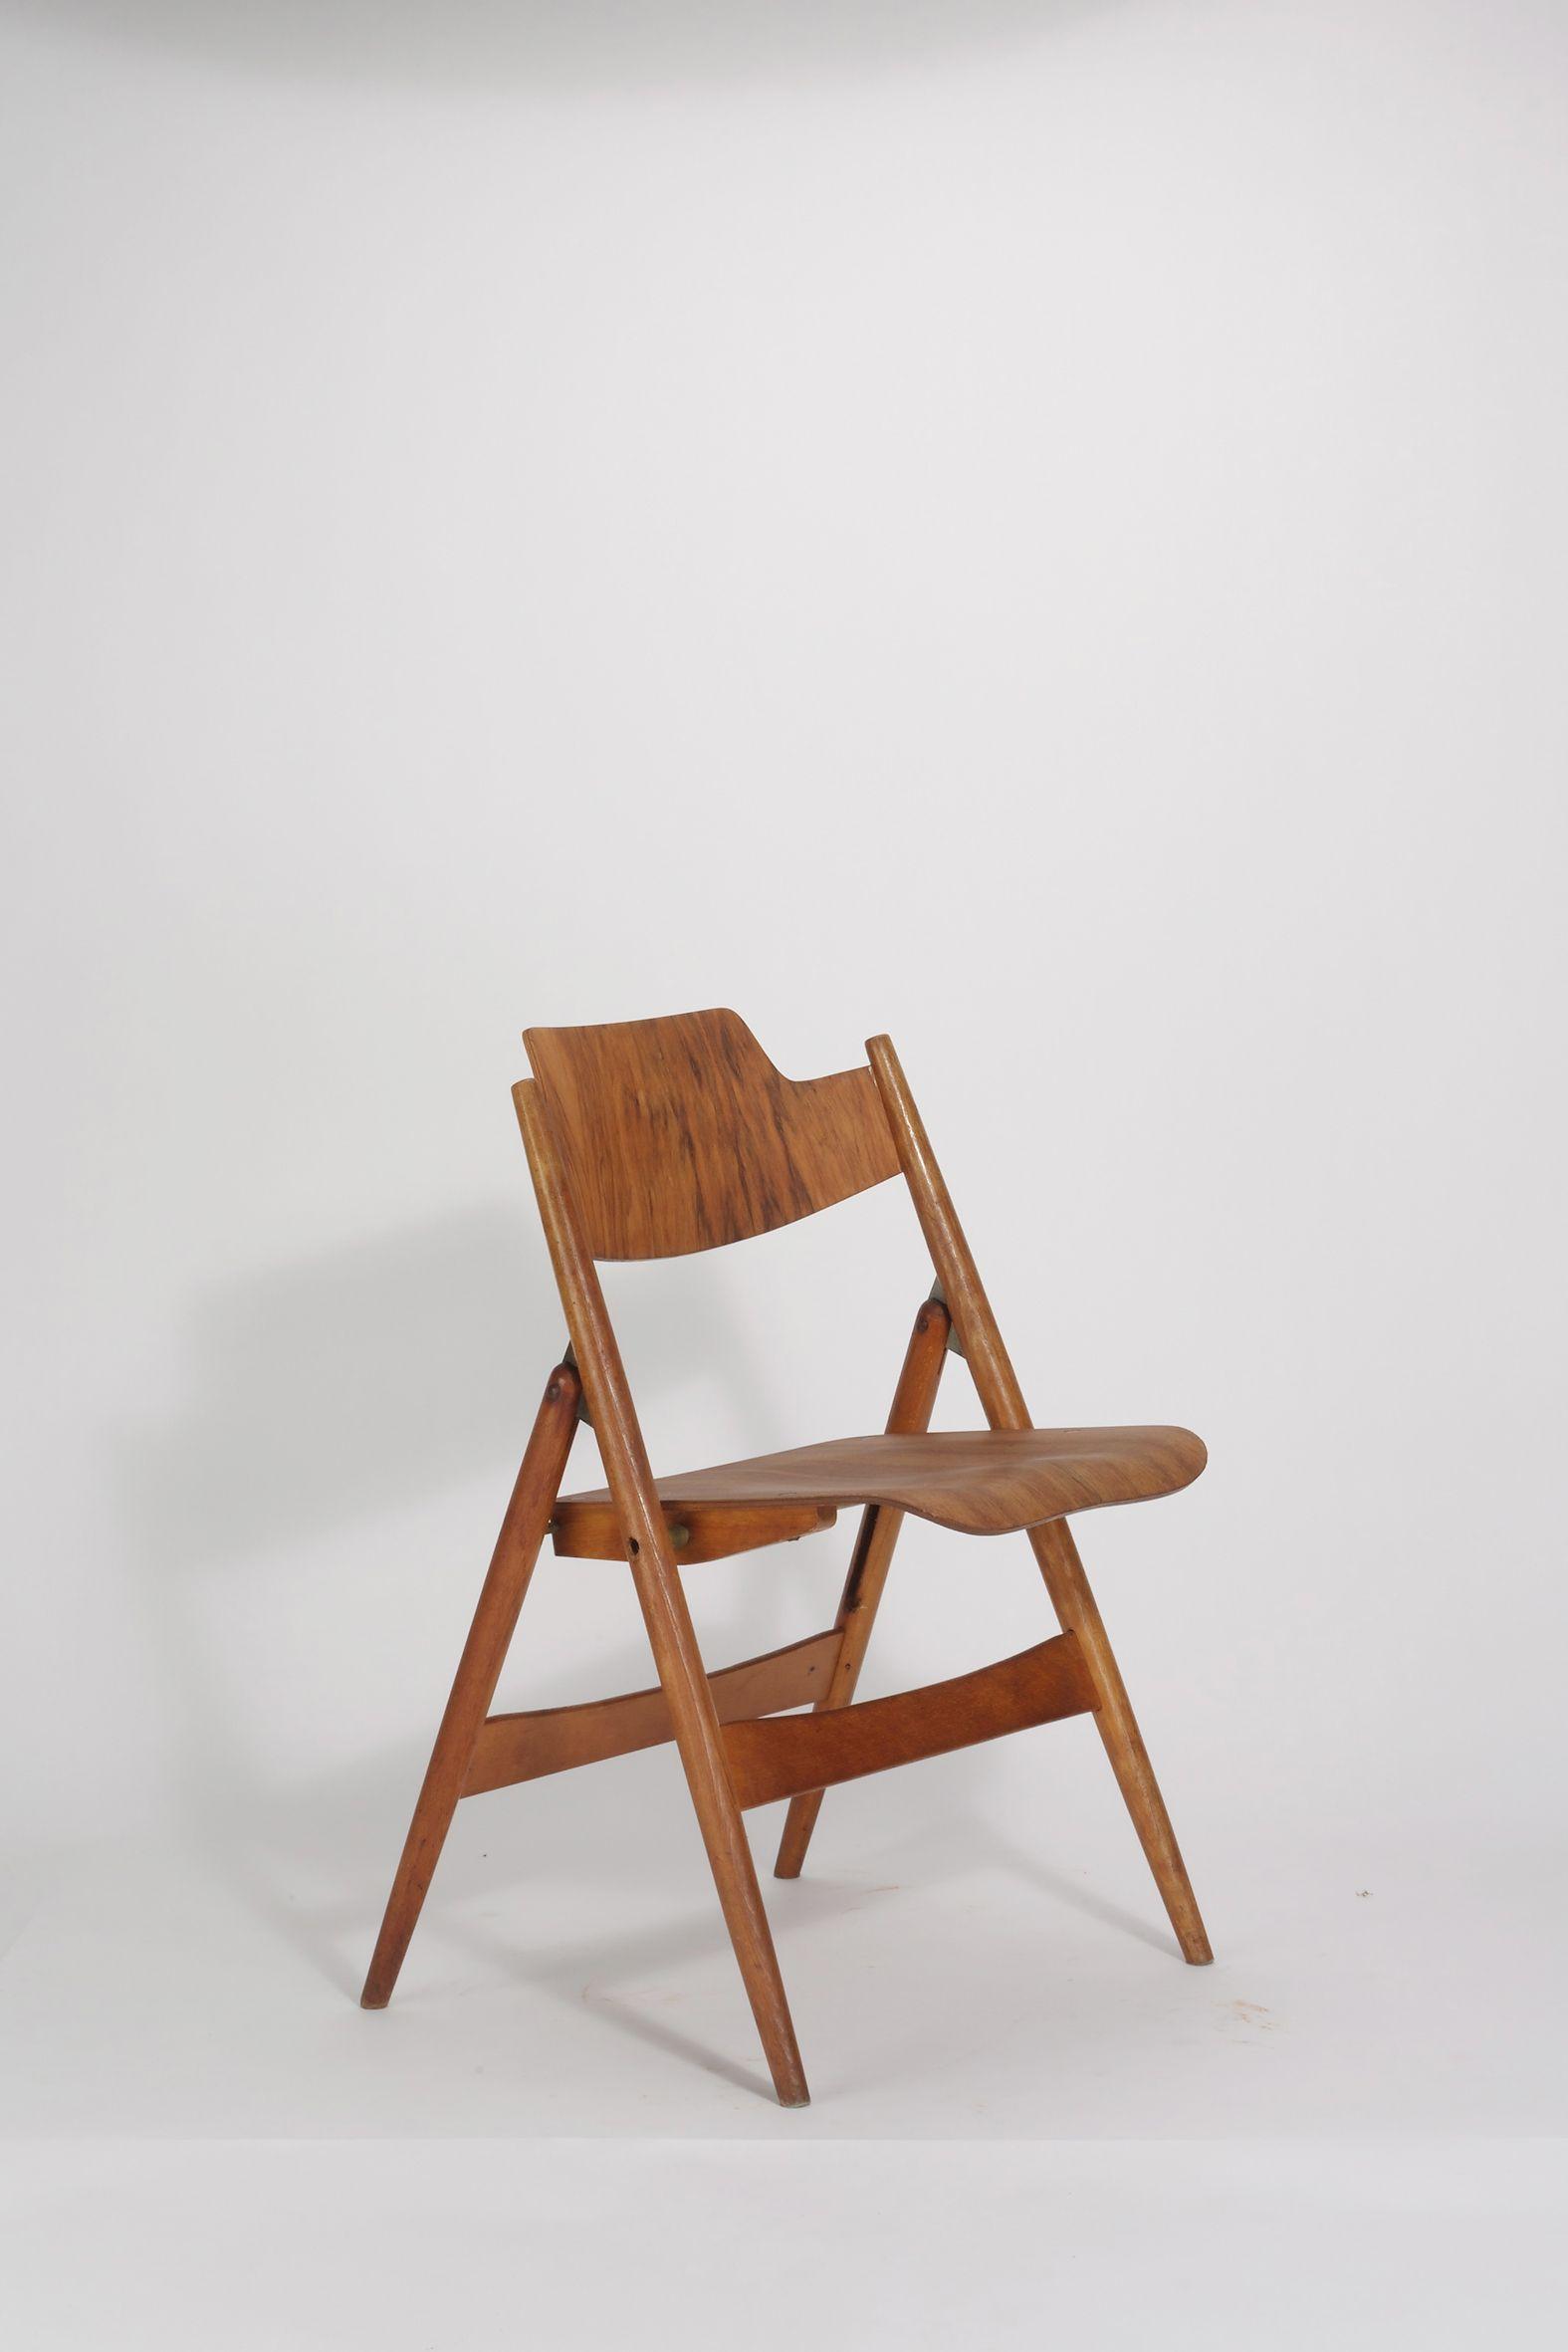 Klappstuhl design  Egon Eiermann, Klappstuhl SE 18 (1952) | CHAIRS | Pinterest ...